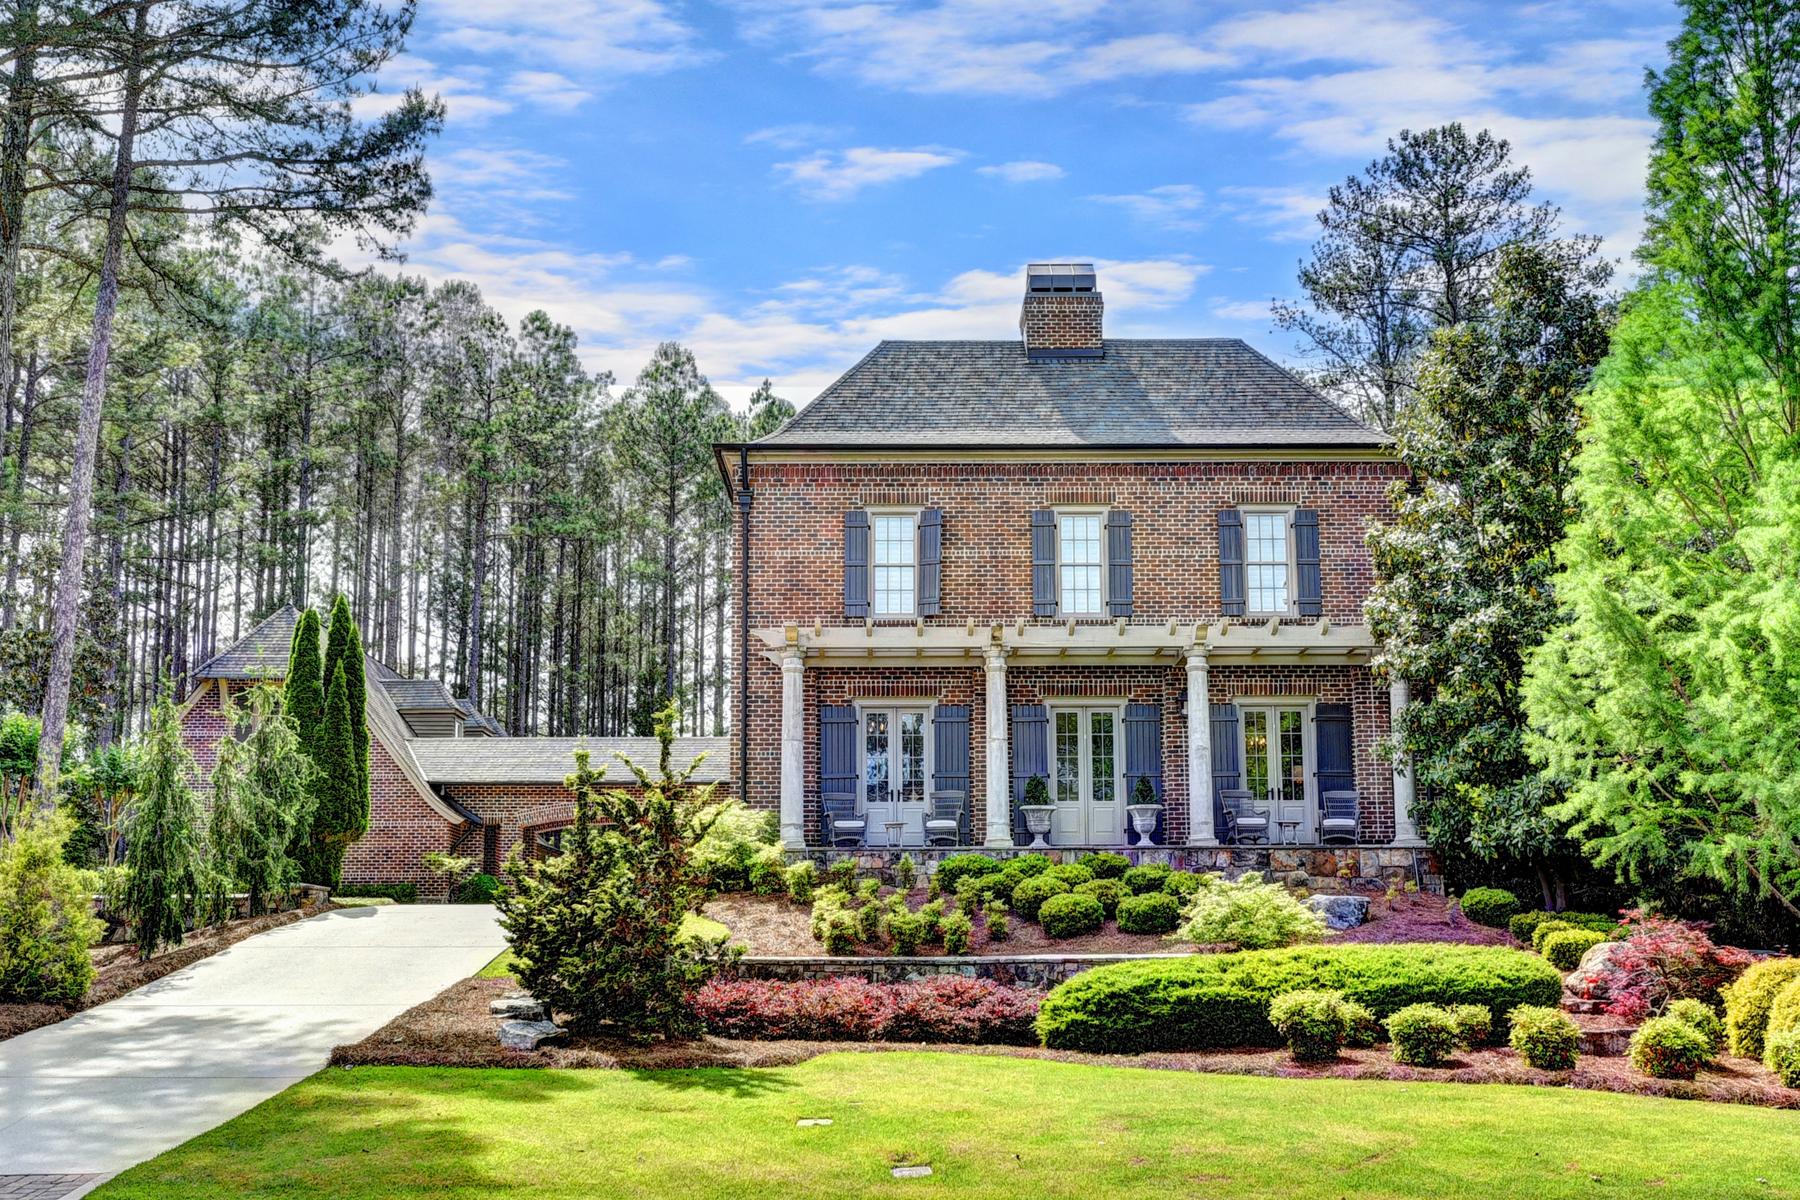 独户住宅 为 销售 在 French Inspired Modern Elegance 839 Middle Fork Trail 萨沃尼, 乔治亚州, 30024 美国